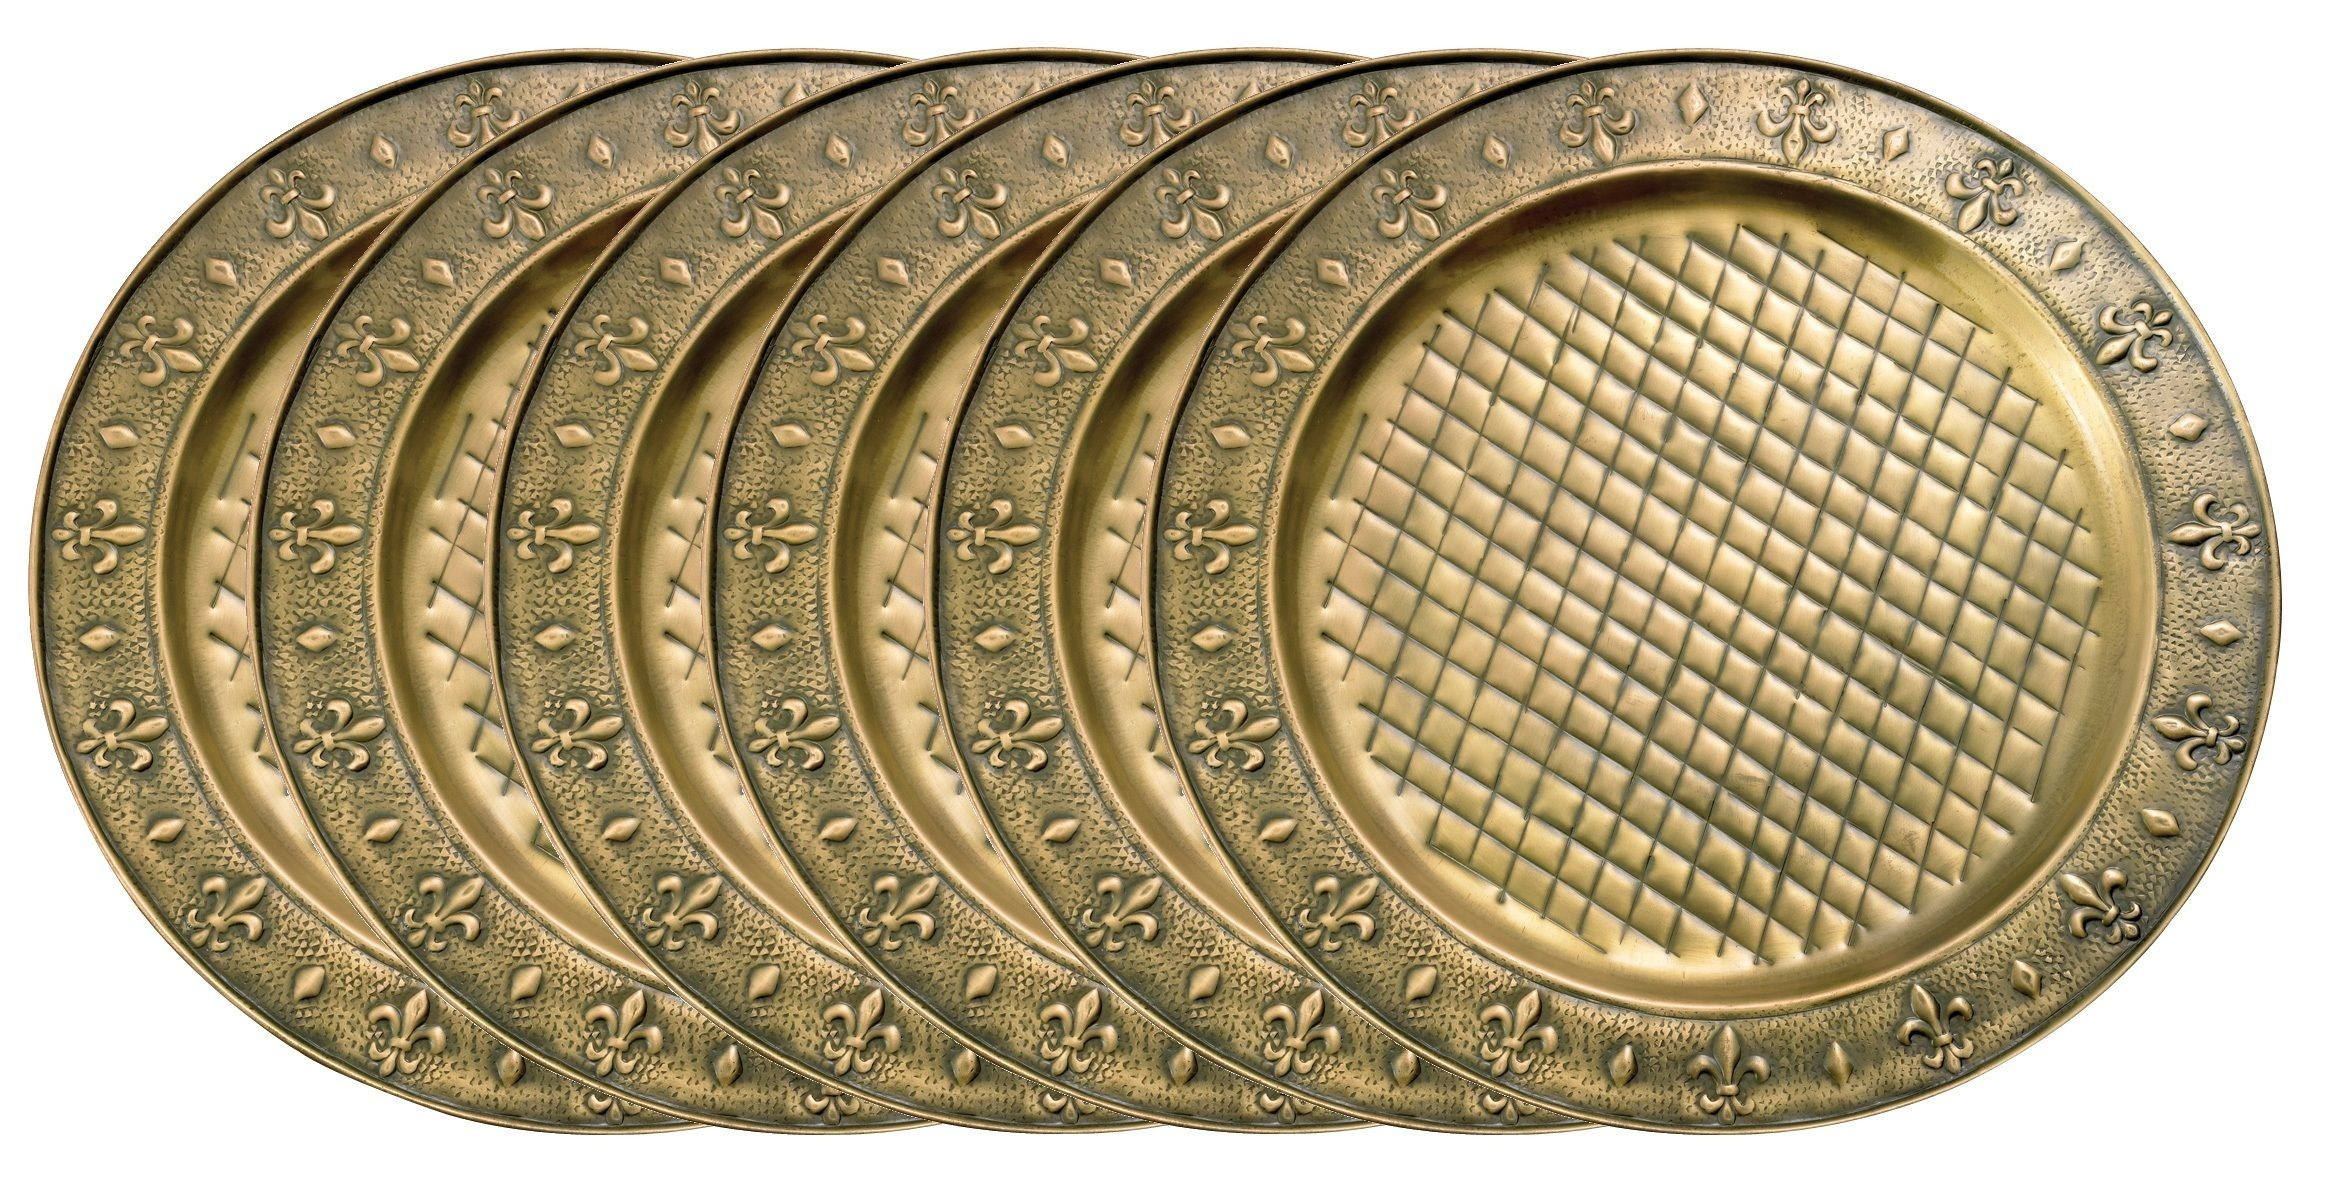 "Old Dutch International OS728 Antique Brass Versailles 13"" Charger Plate, Set of 6"